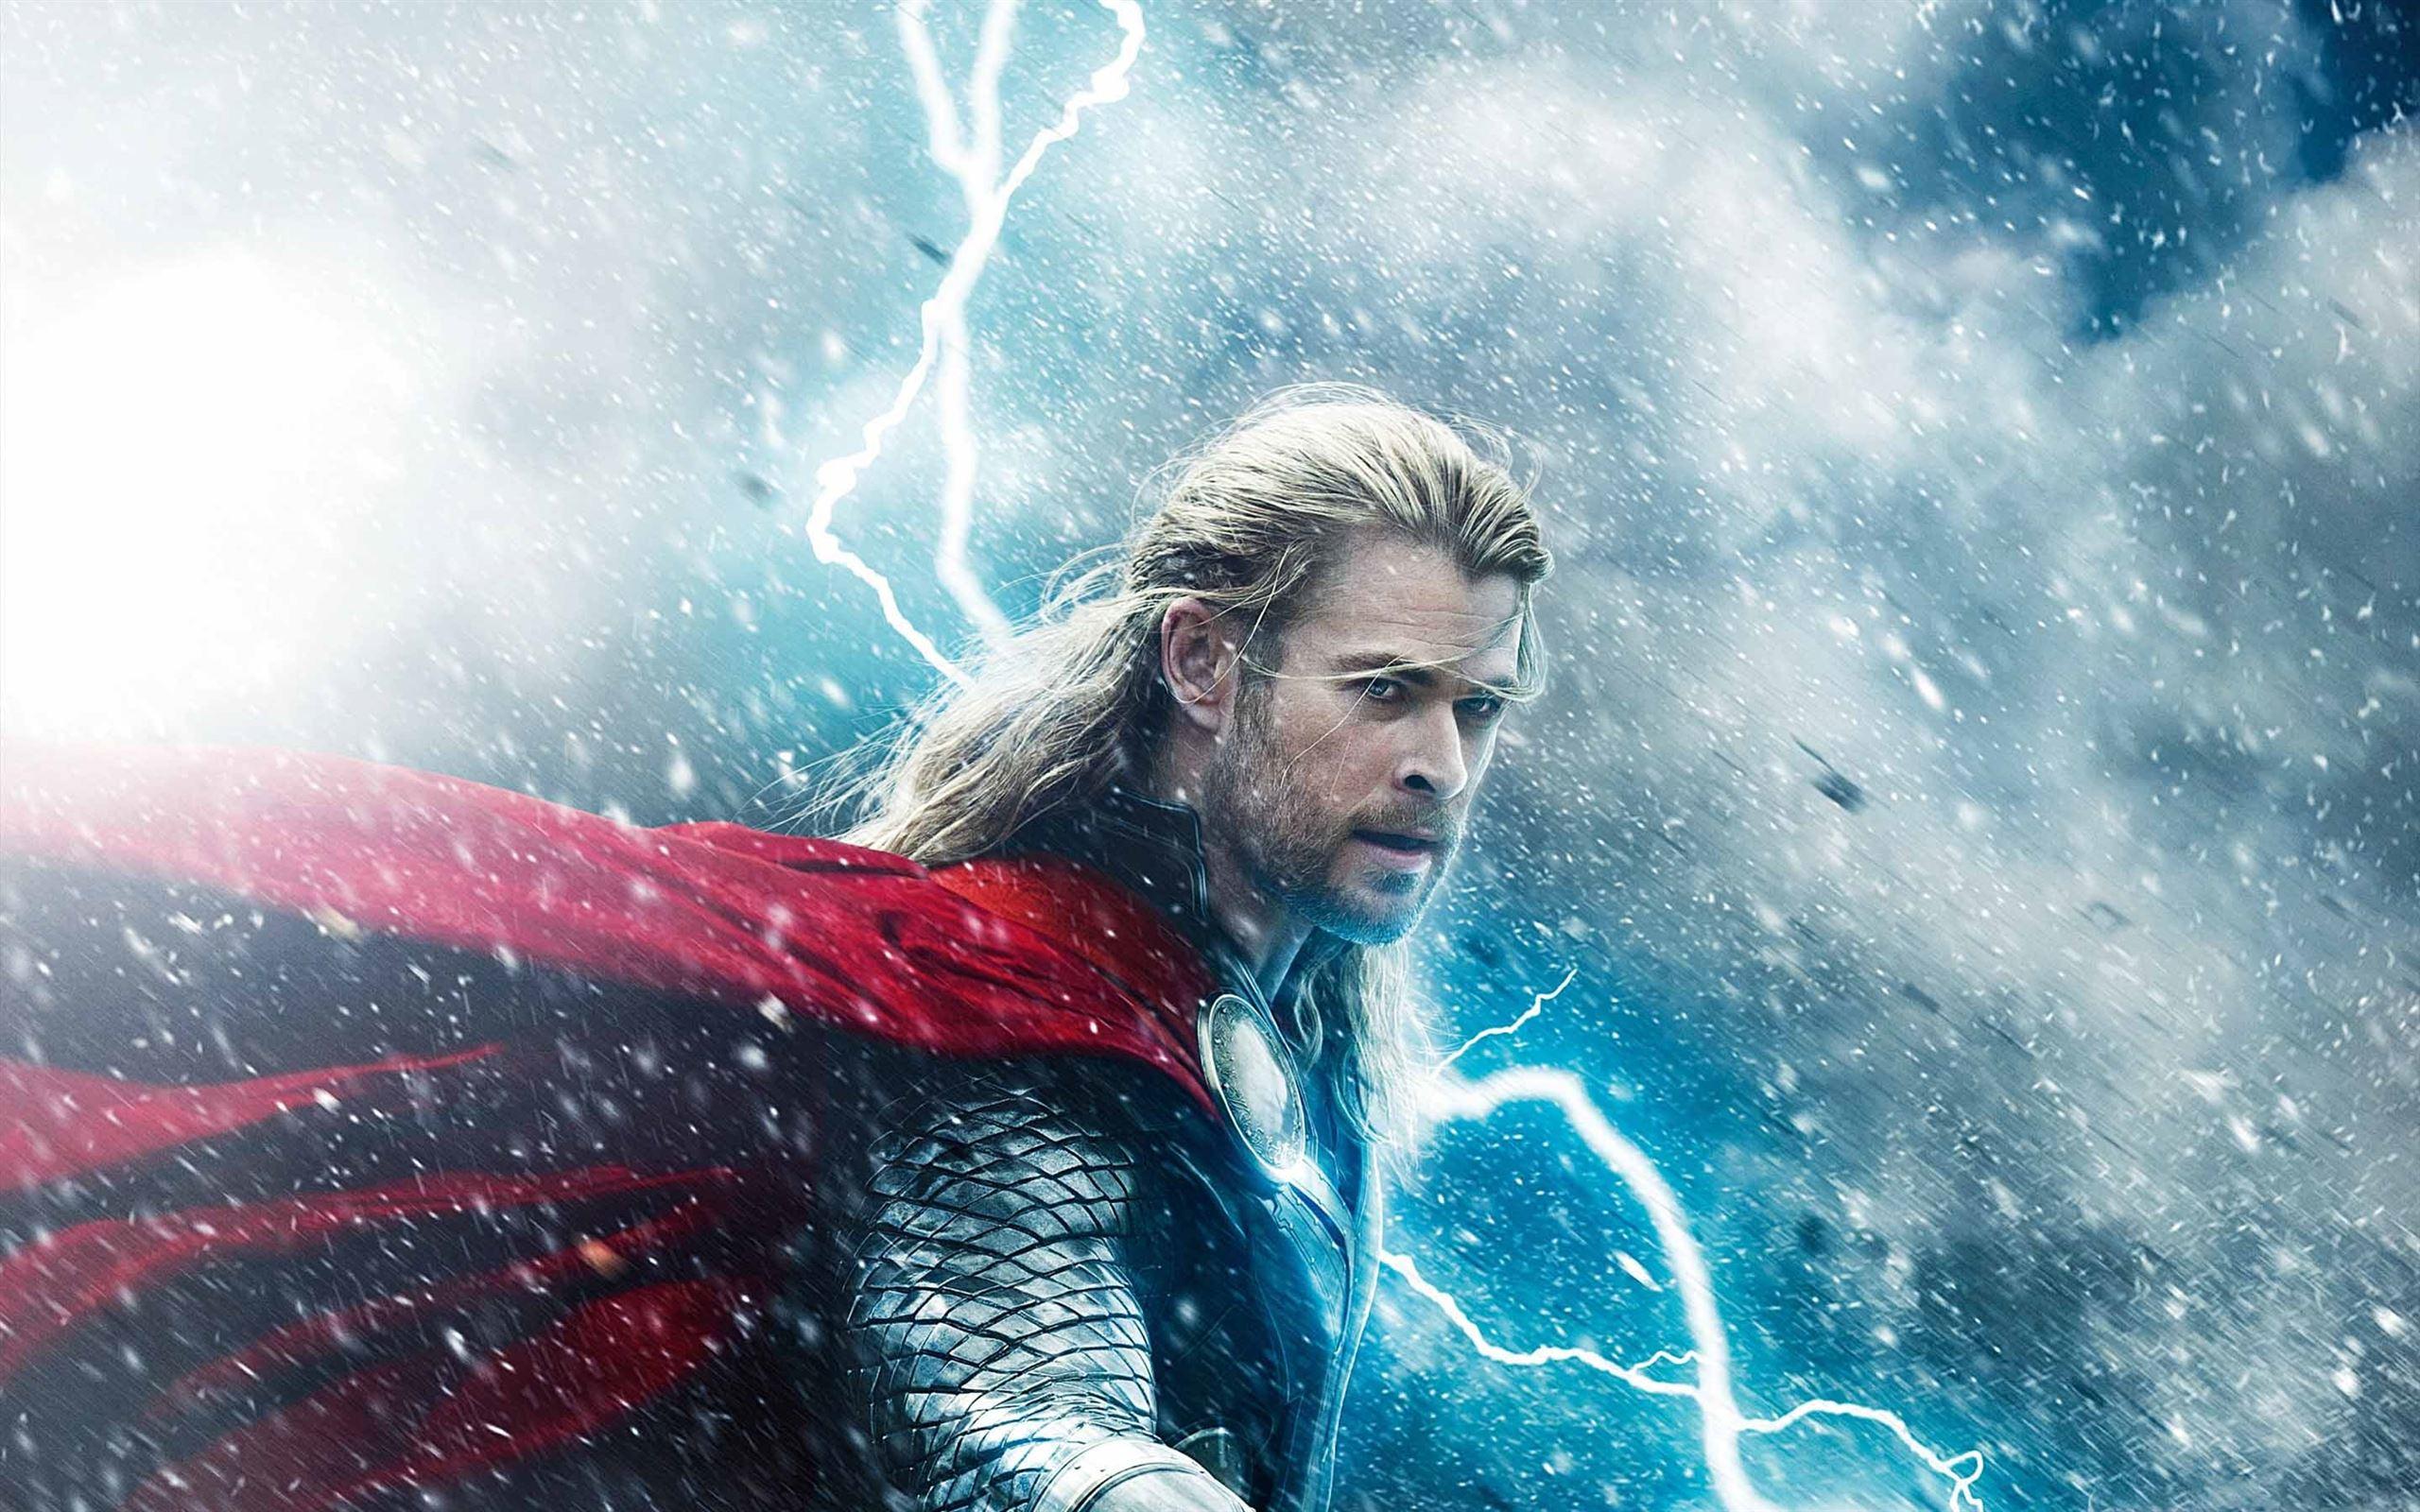 Thor The Dark World Macbook Air Wallpaper Download Allmacwallpaper